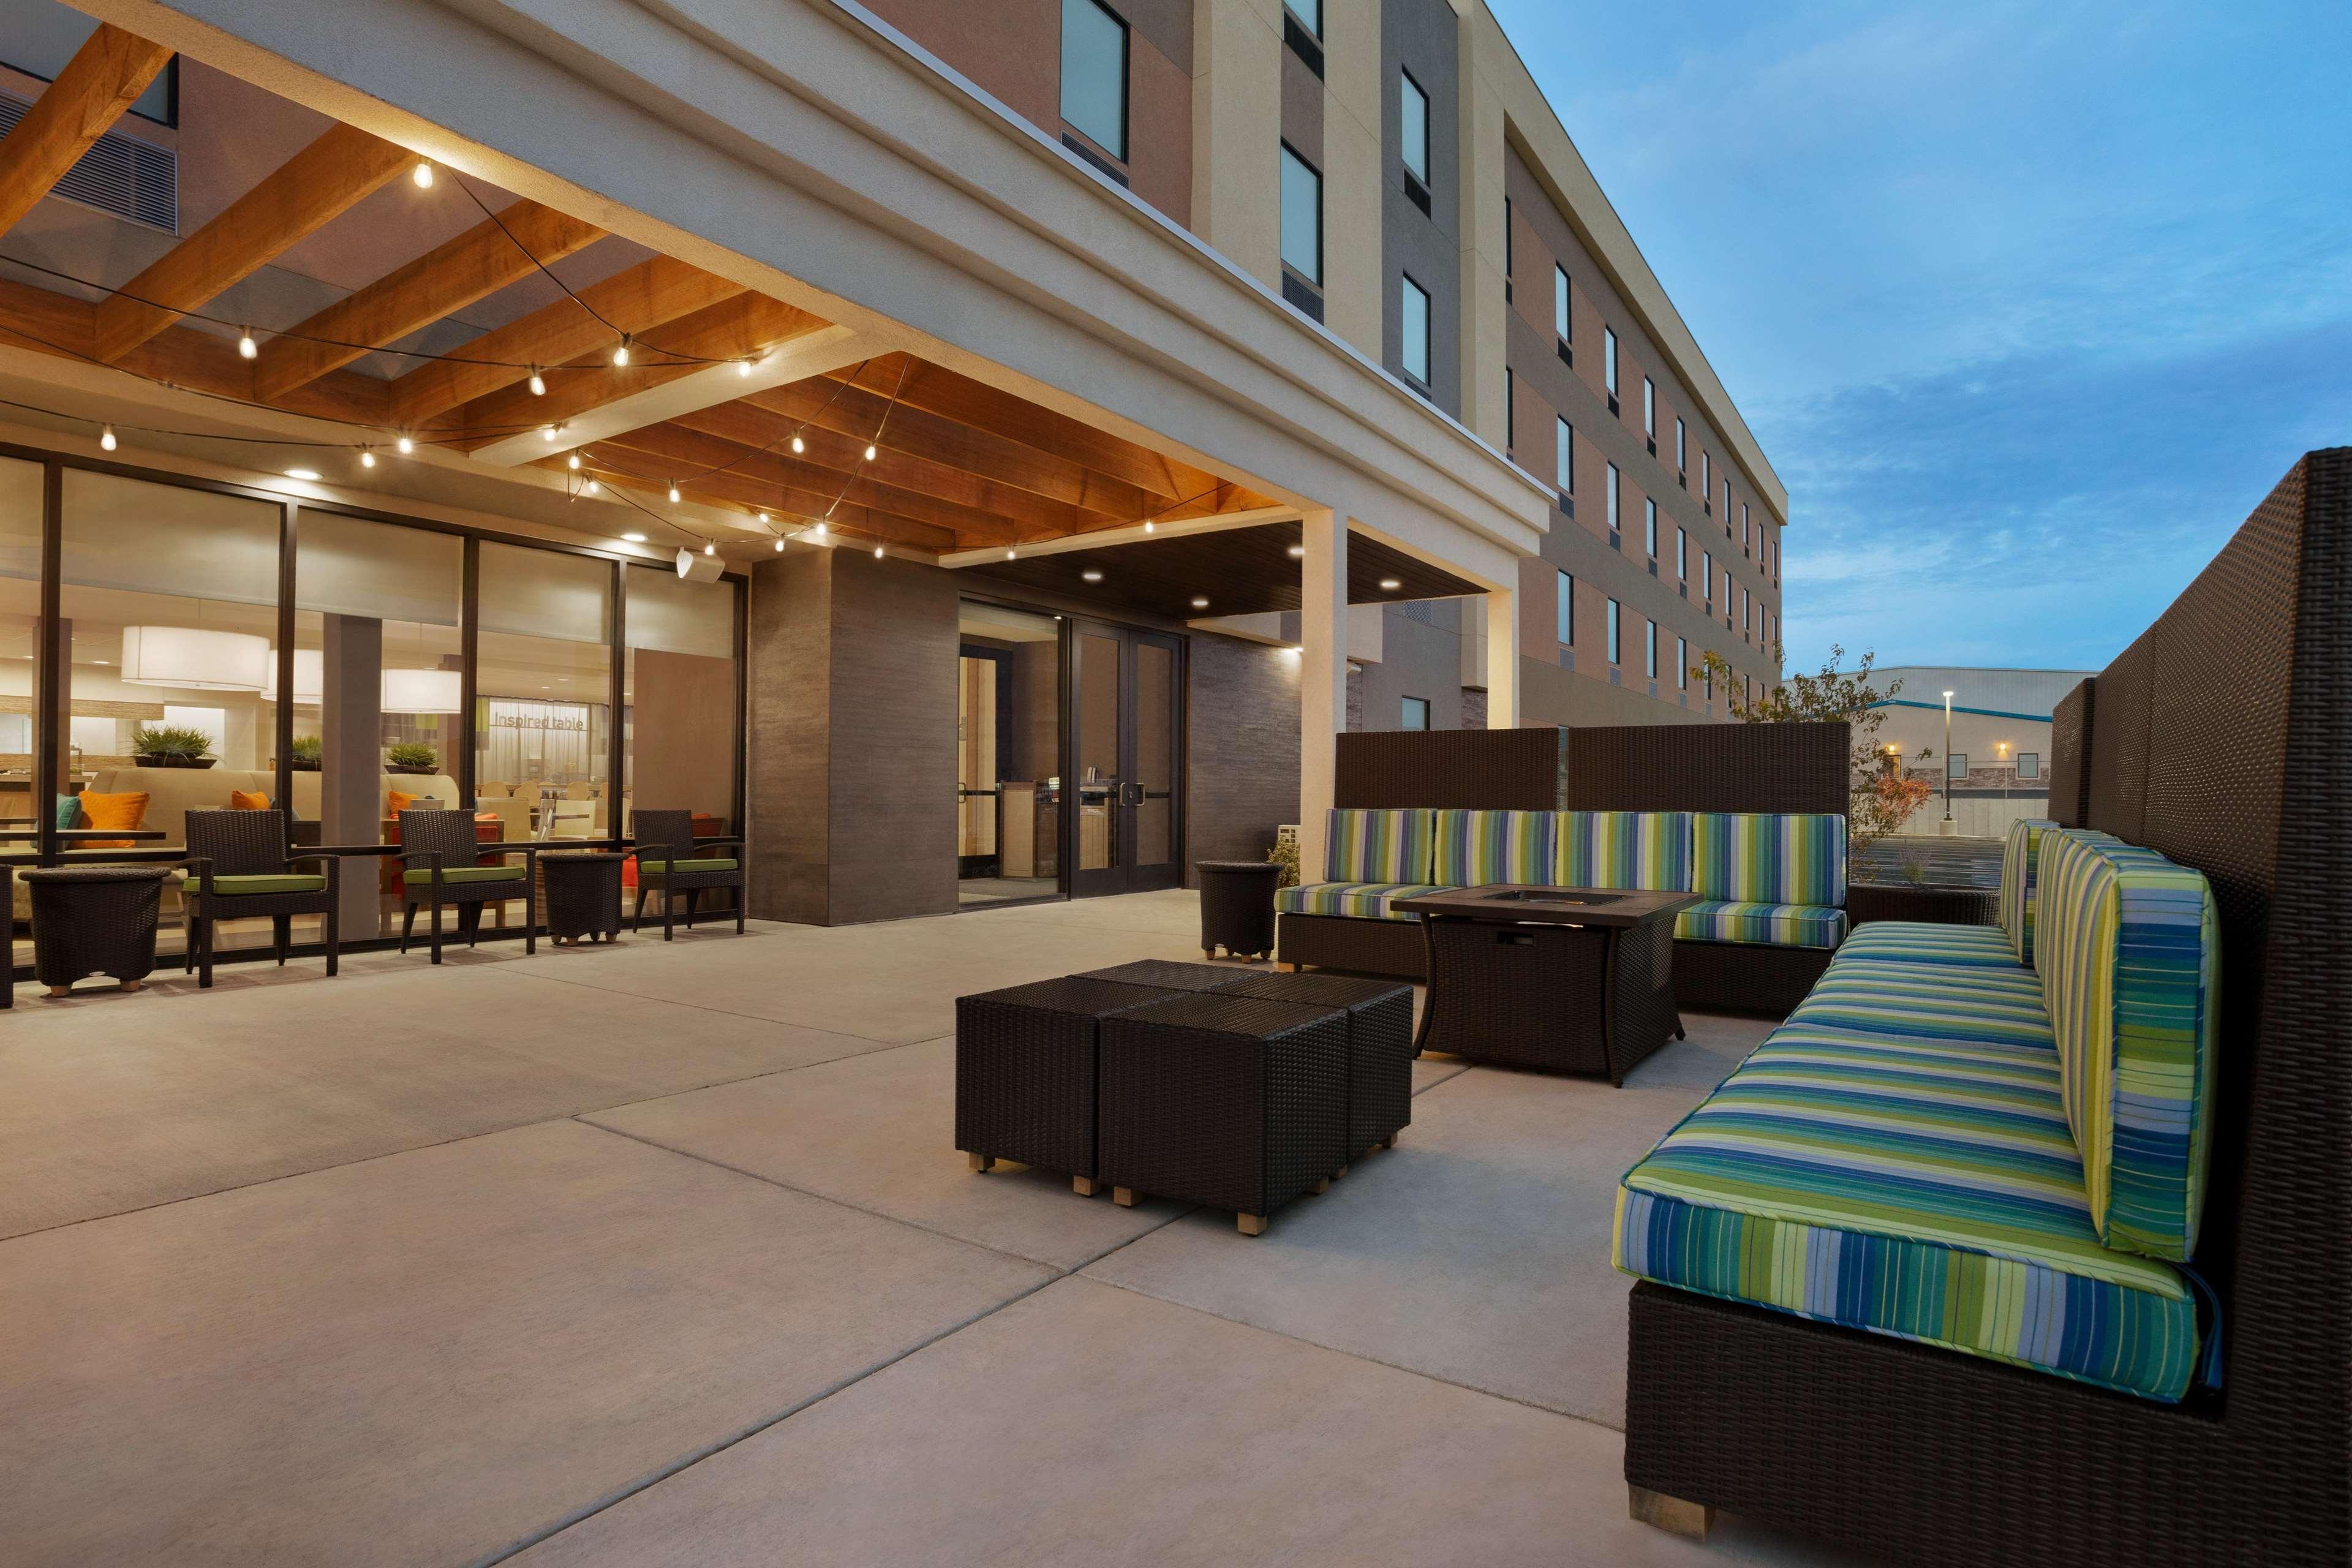 Home2 Suites by Hilton Elko image 3